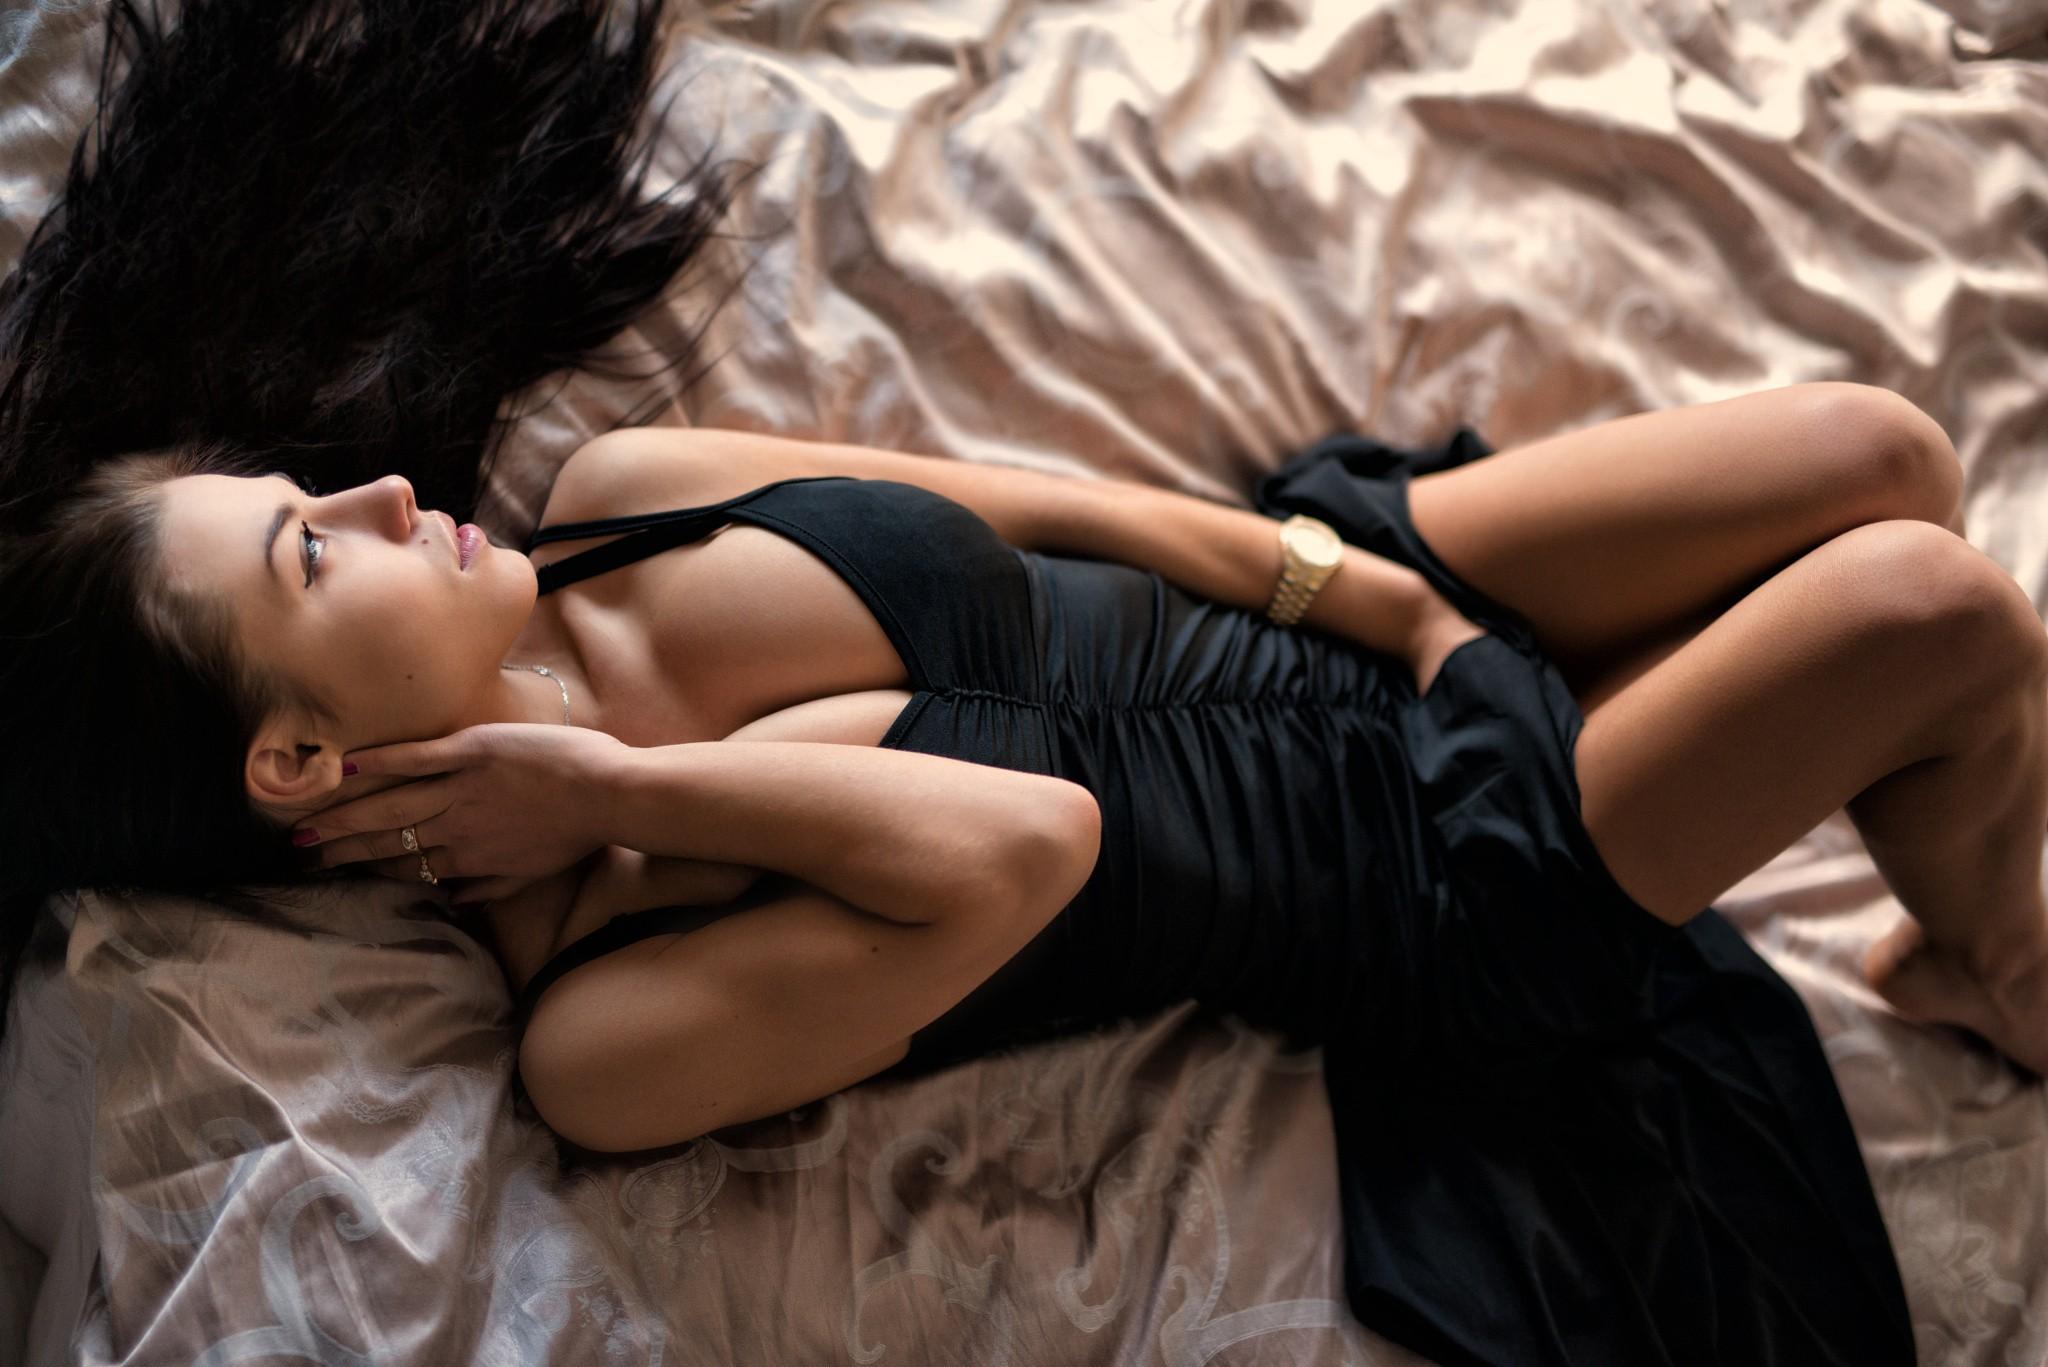 sexy pictures of julia mancuso